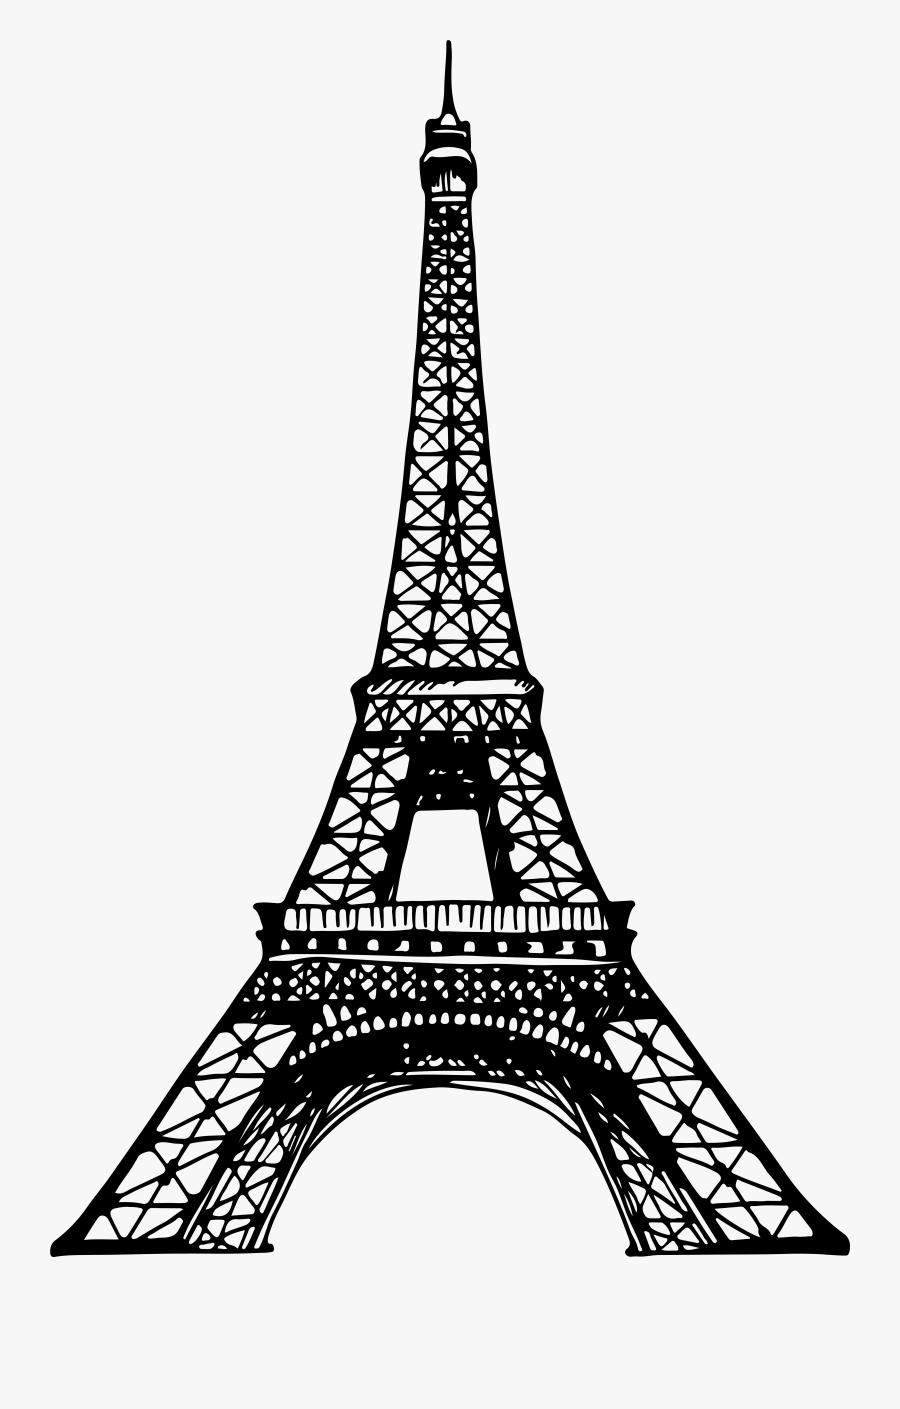 Transparent Radio Tower Clipart - Free Eiffel Tower Clipart, Transparent Clipart